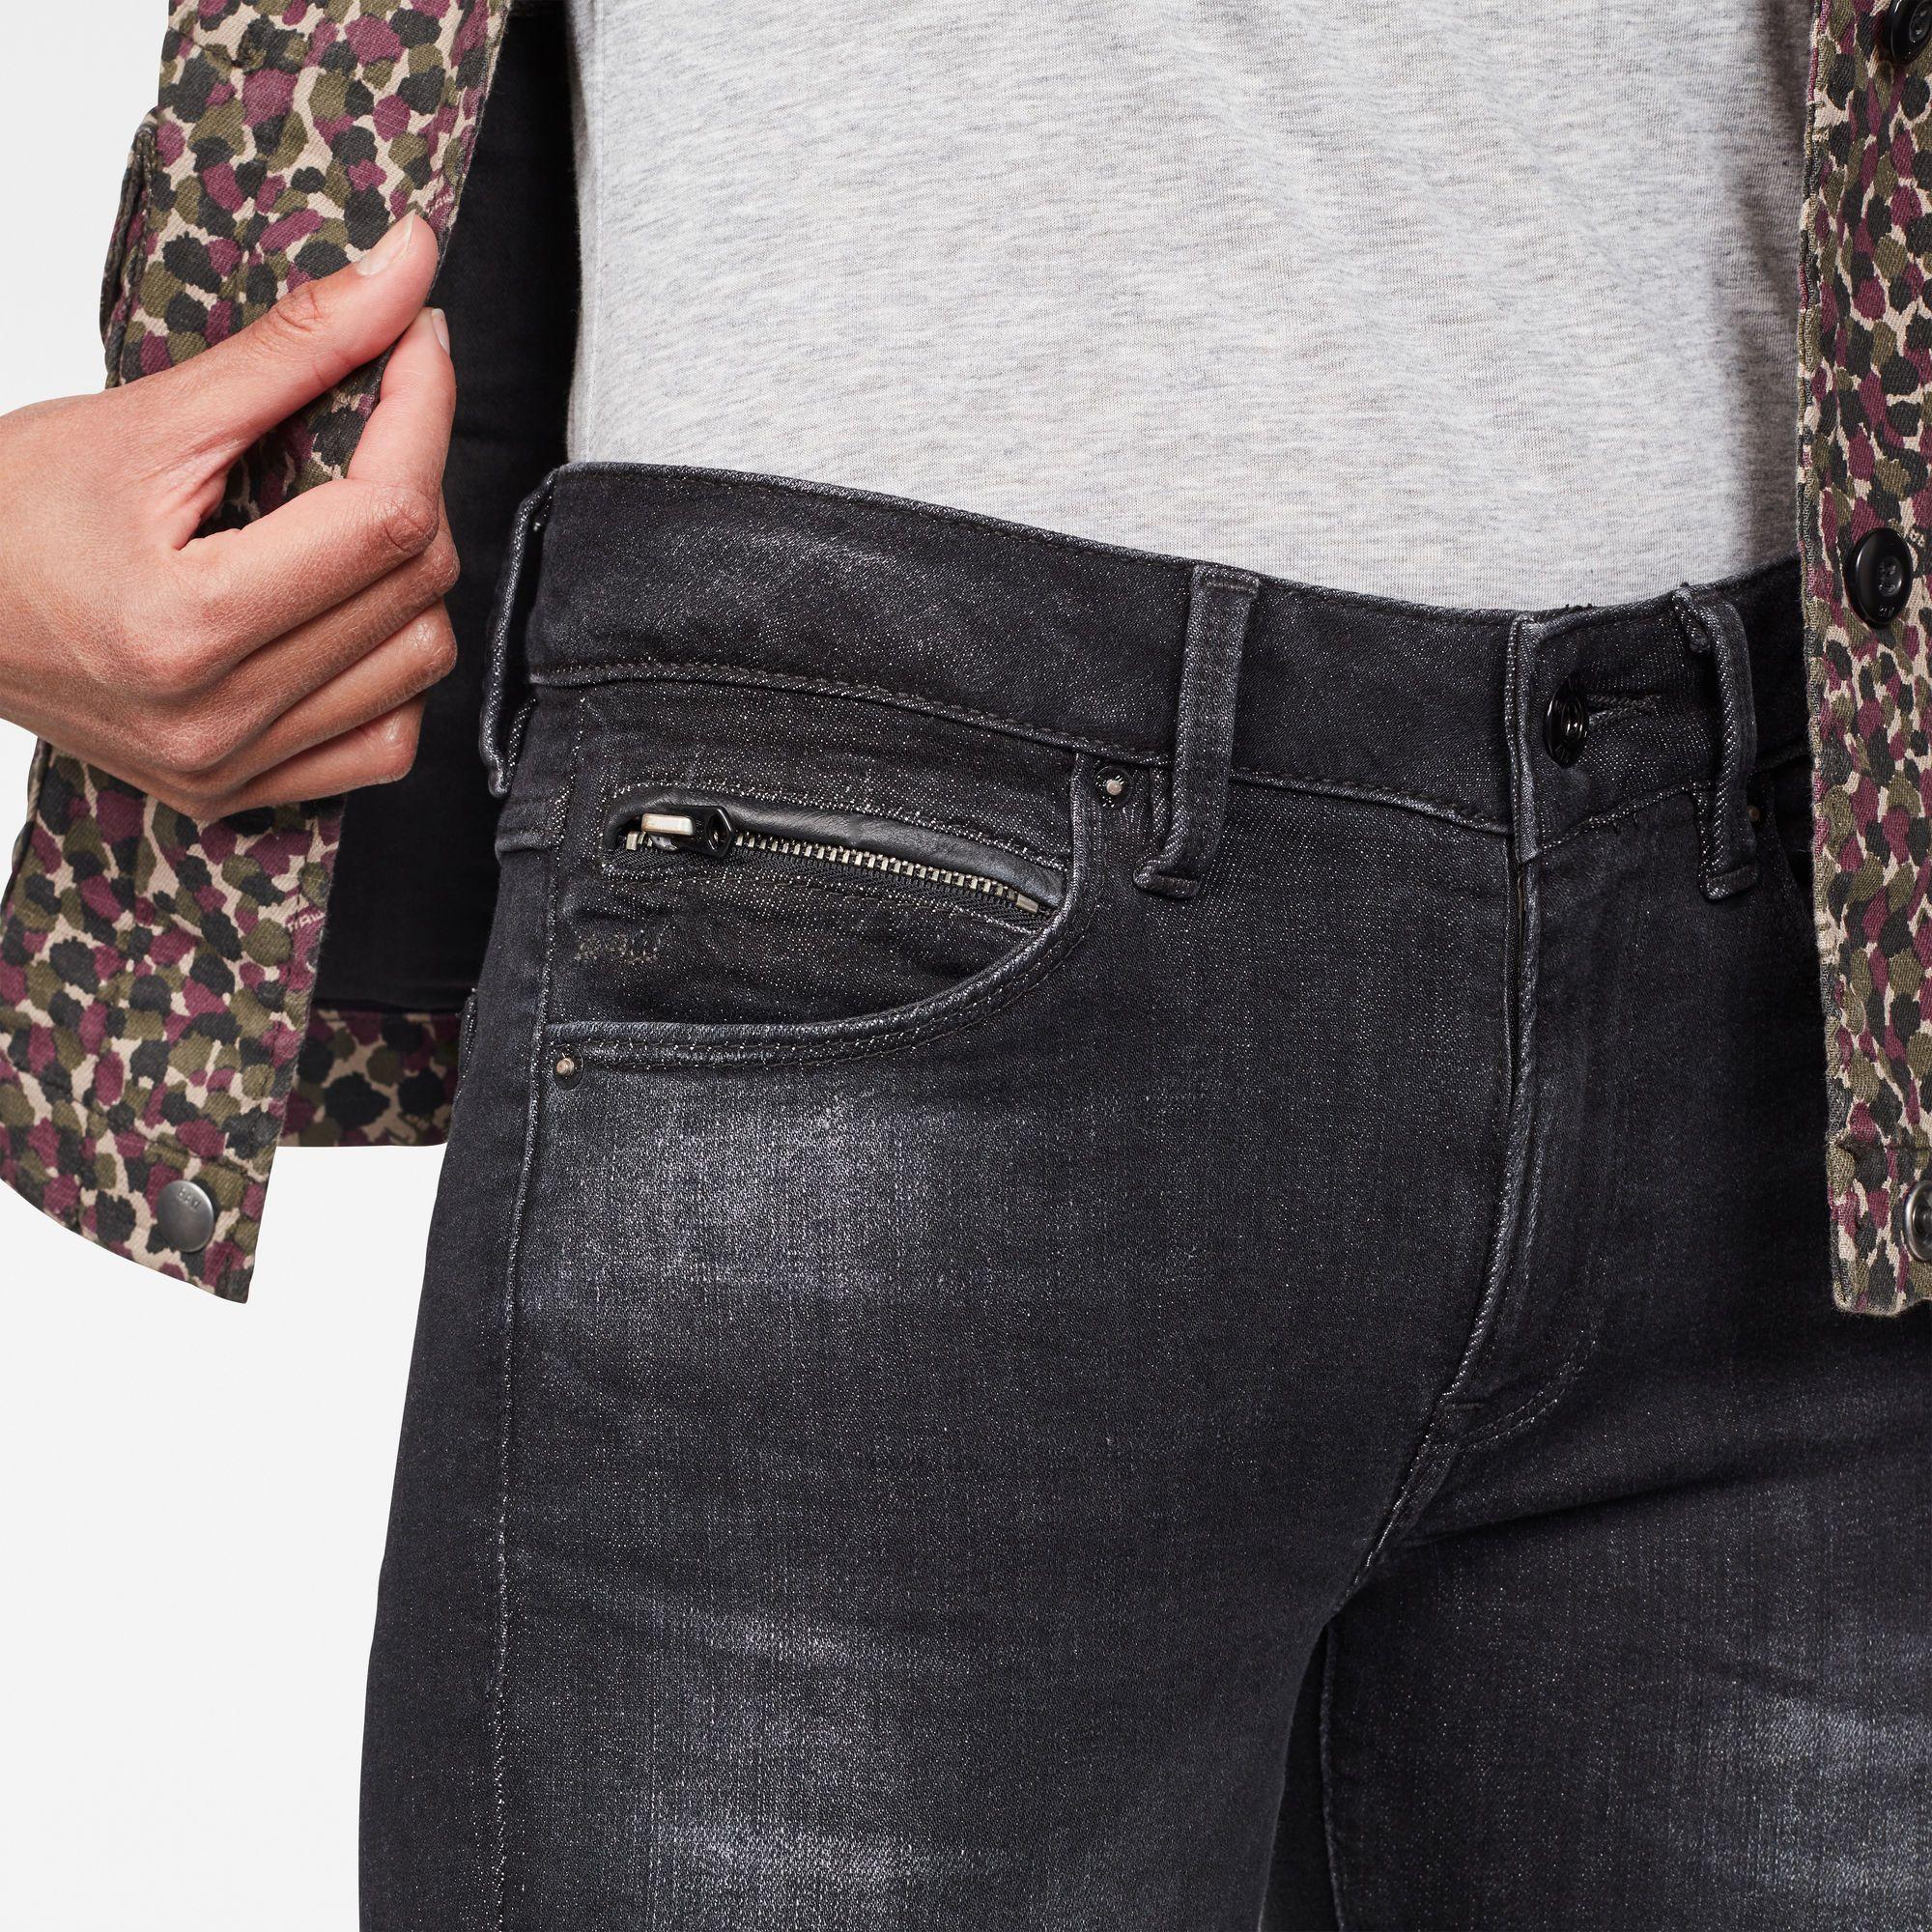 G-Star RAW 3301 Studs Mid Skinny Jeans